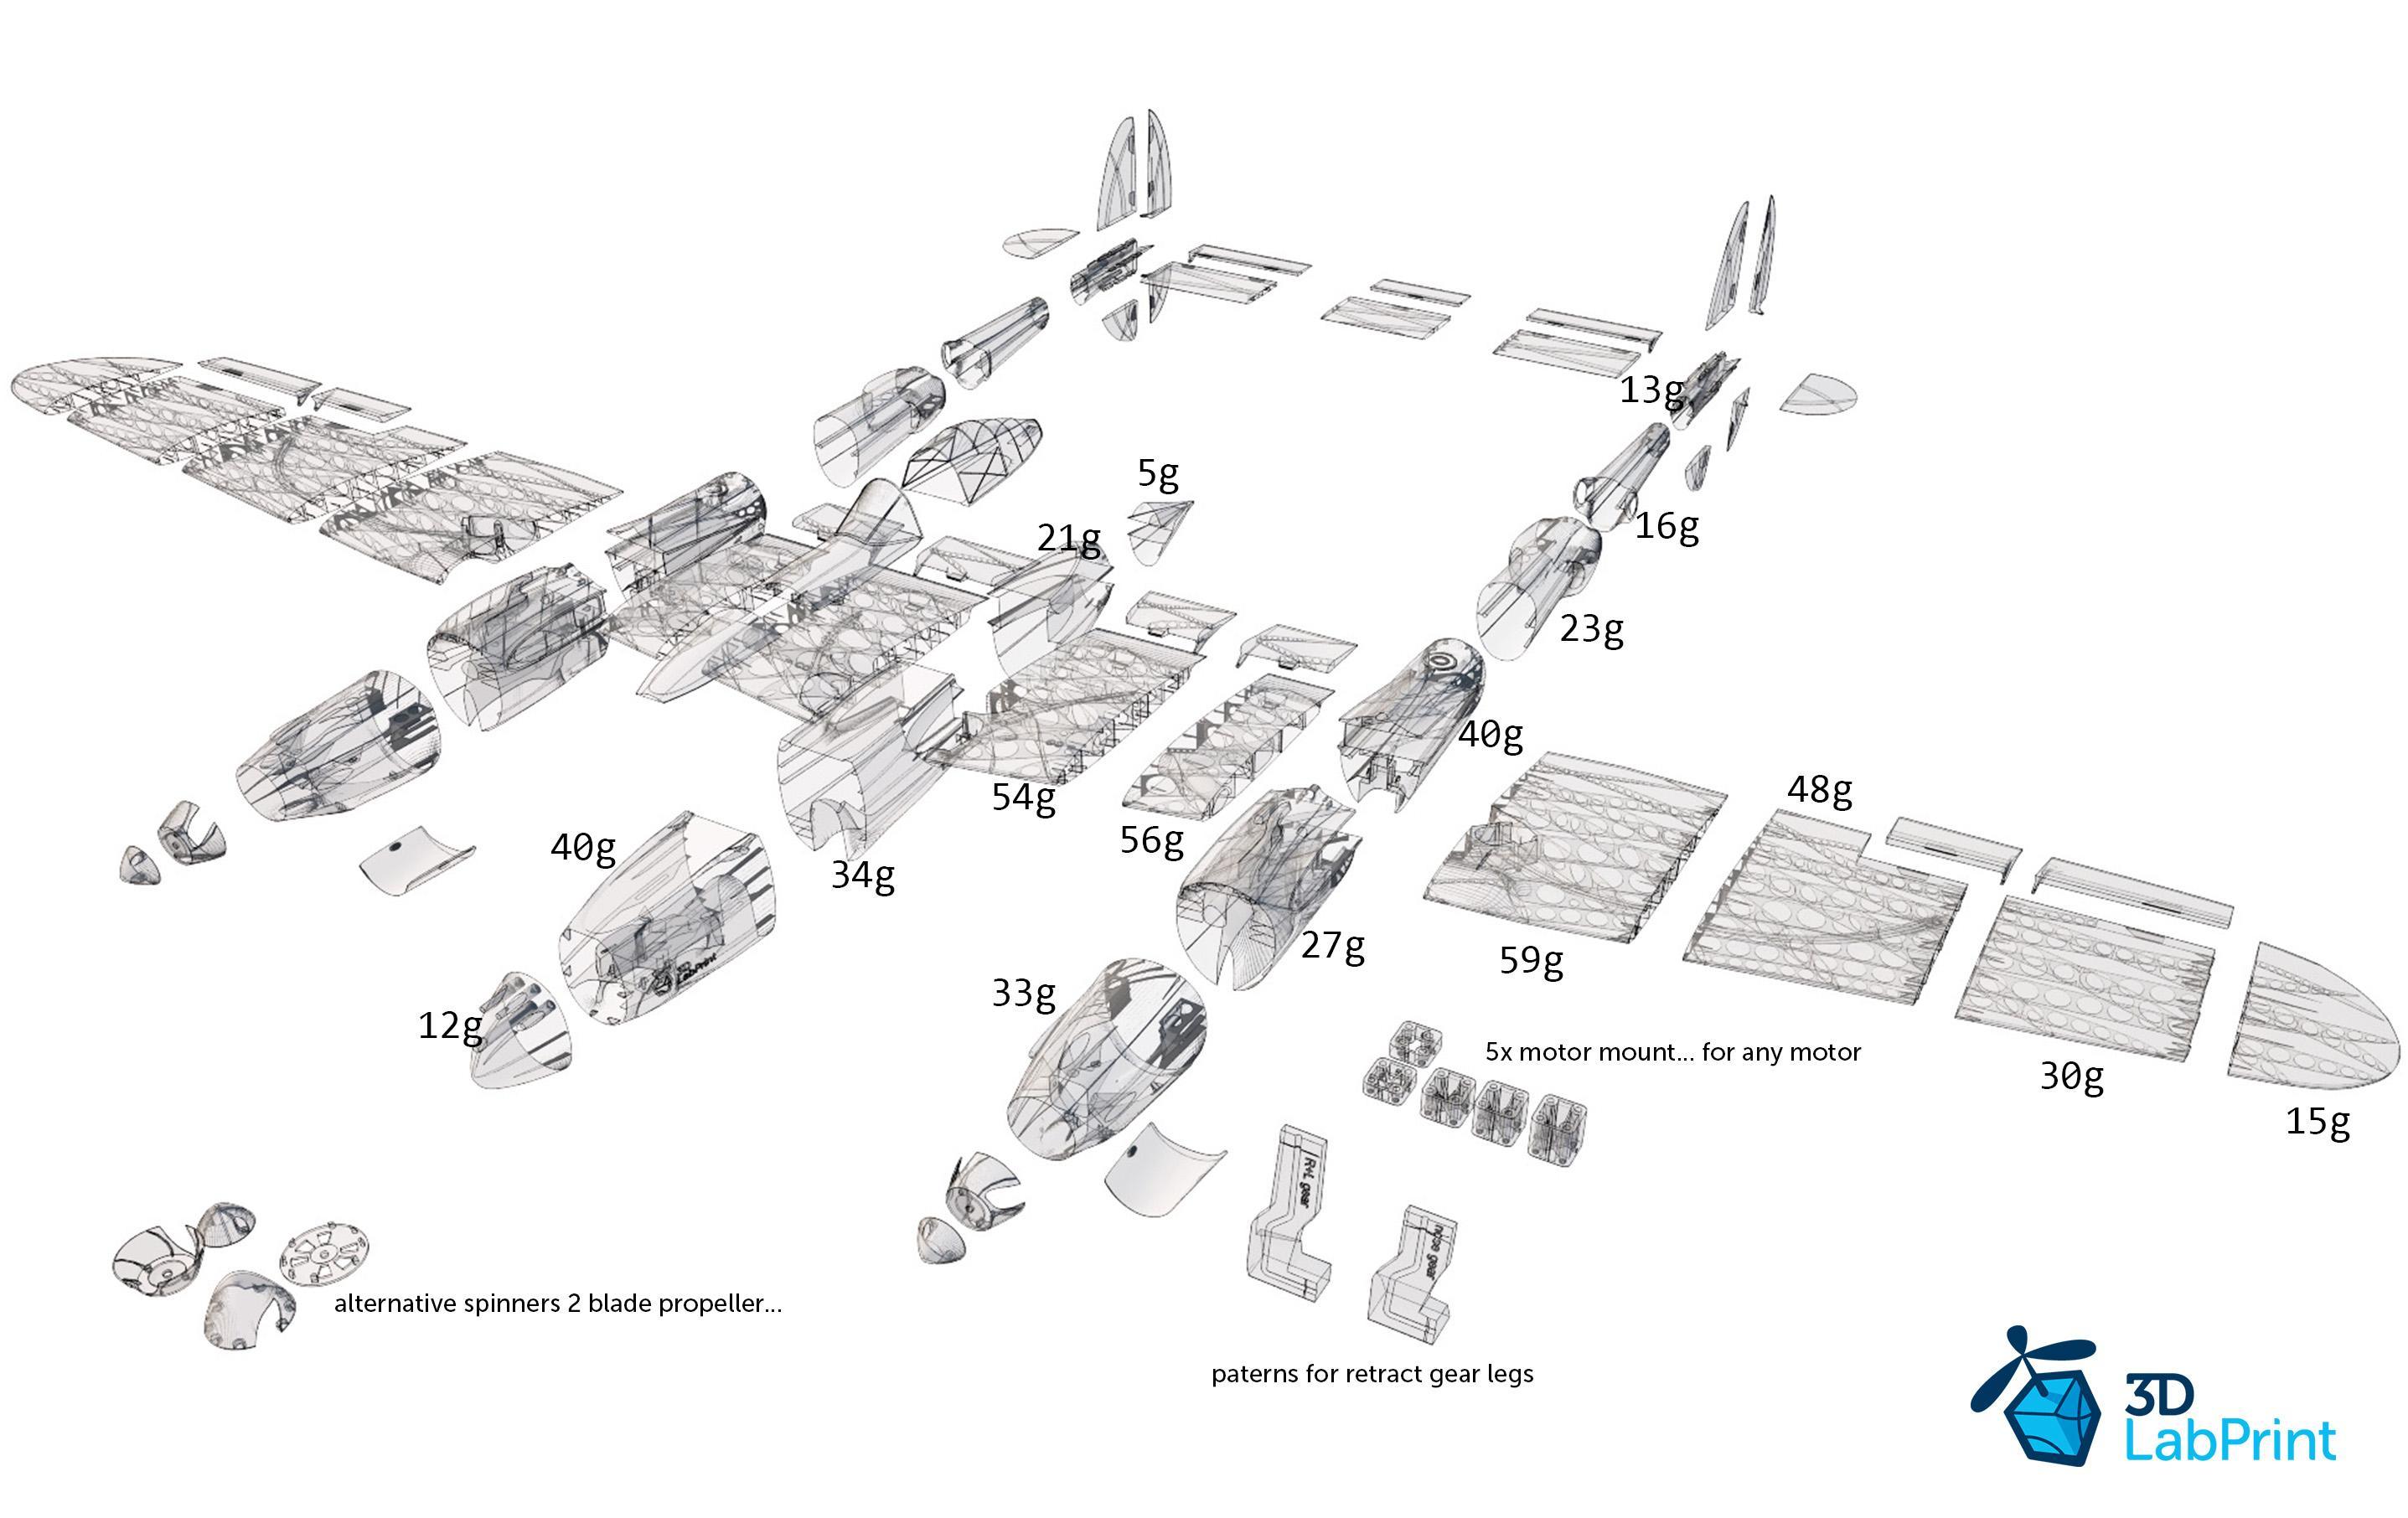 3DLabPrint Introduces Latest 3D Printable Model Airplane